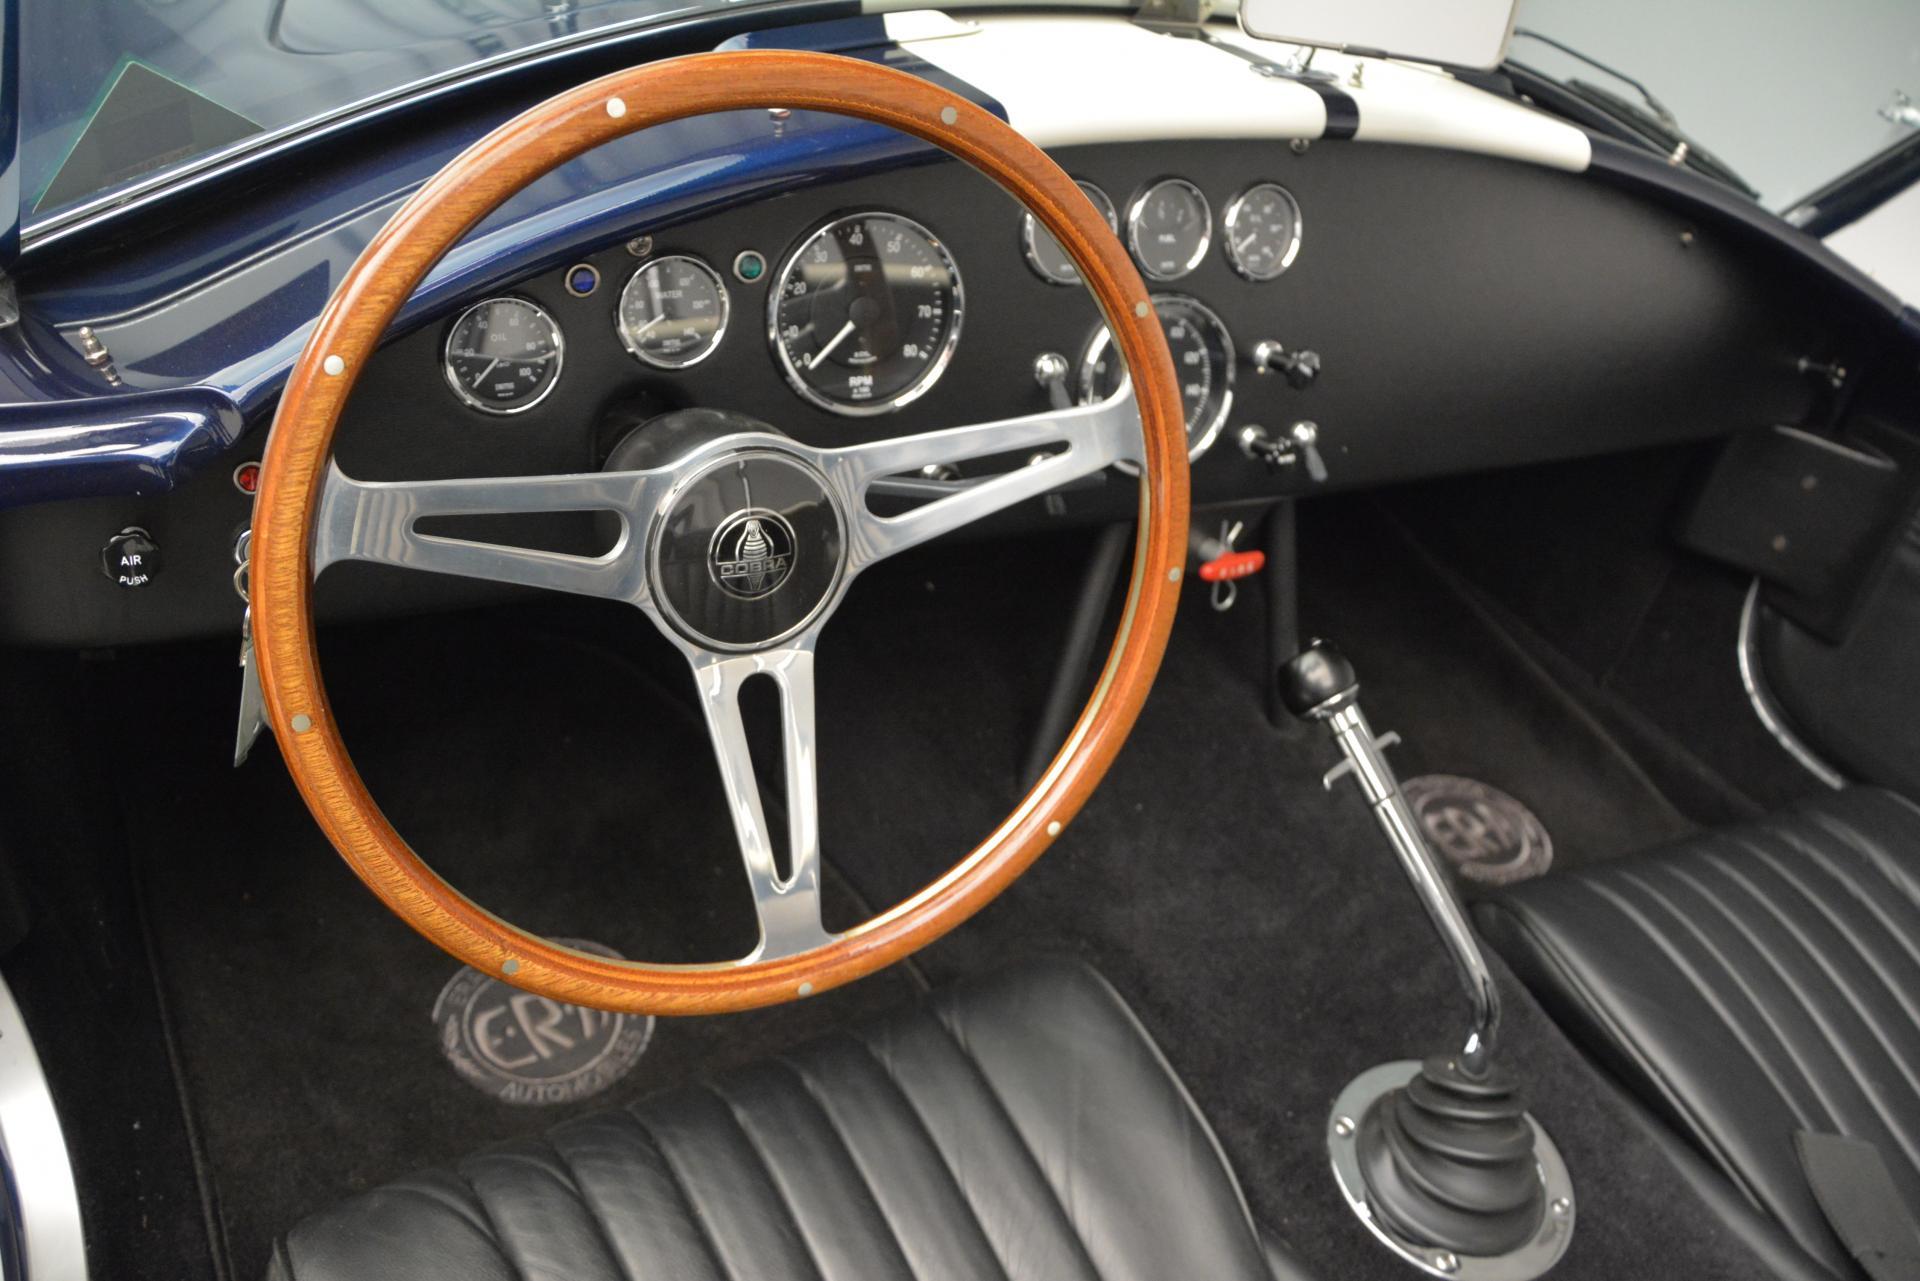 Used 2006 Ford ERA 427 SC  For Sale In Greenwich, CT. Alfa Romeo of Greenwich, 7051 107_p14